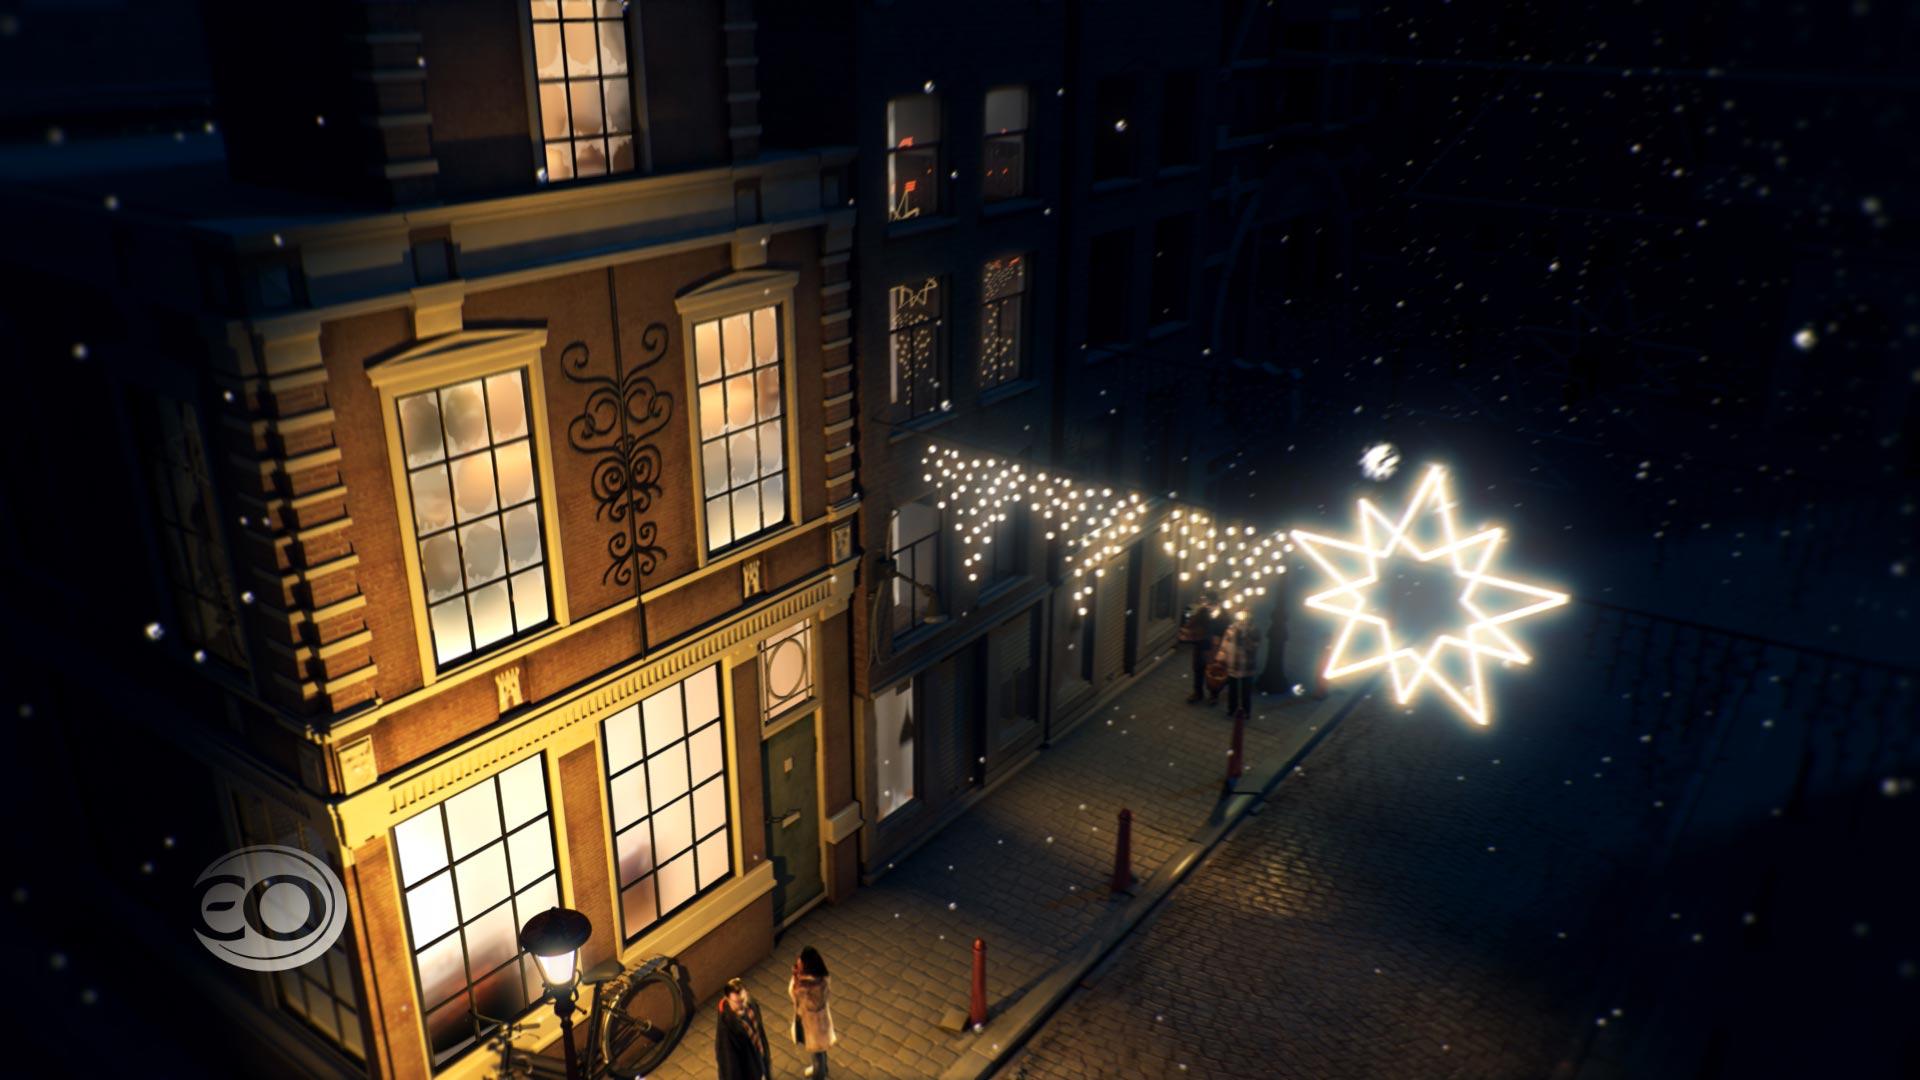 EO_Kerst-brengt-Licht-12sec-HD_1